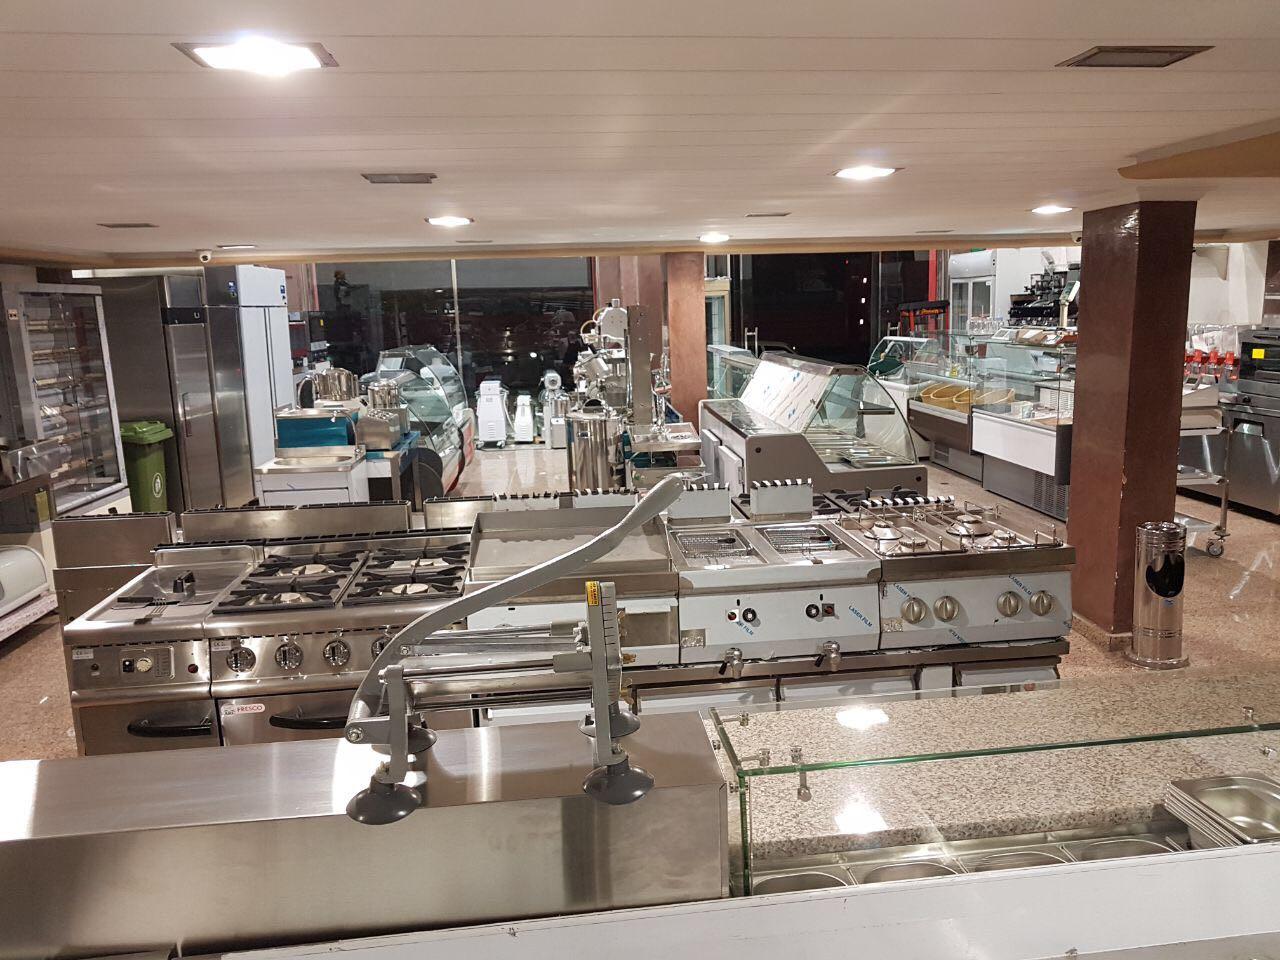 P tisserie mat riel cuisine pro maroc - Materiel cuisine patisserie ...